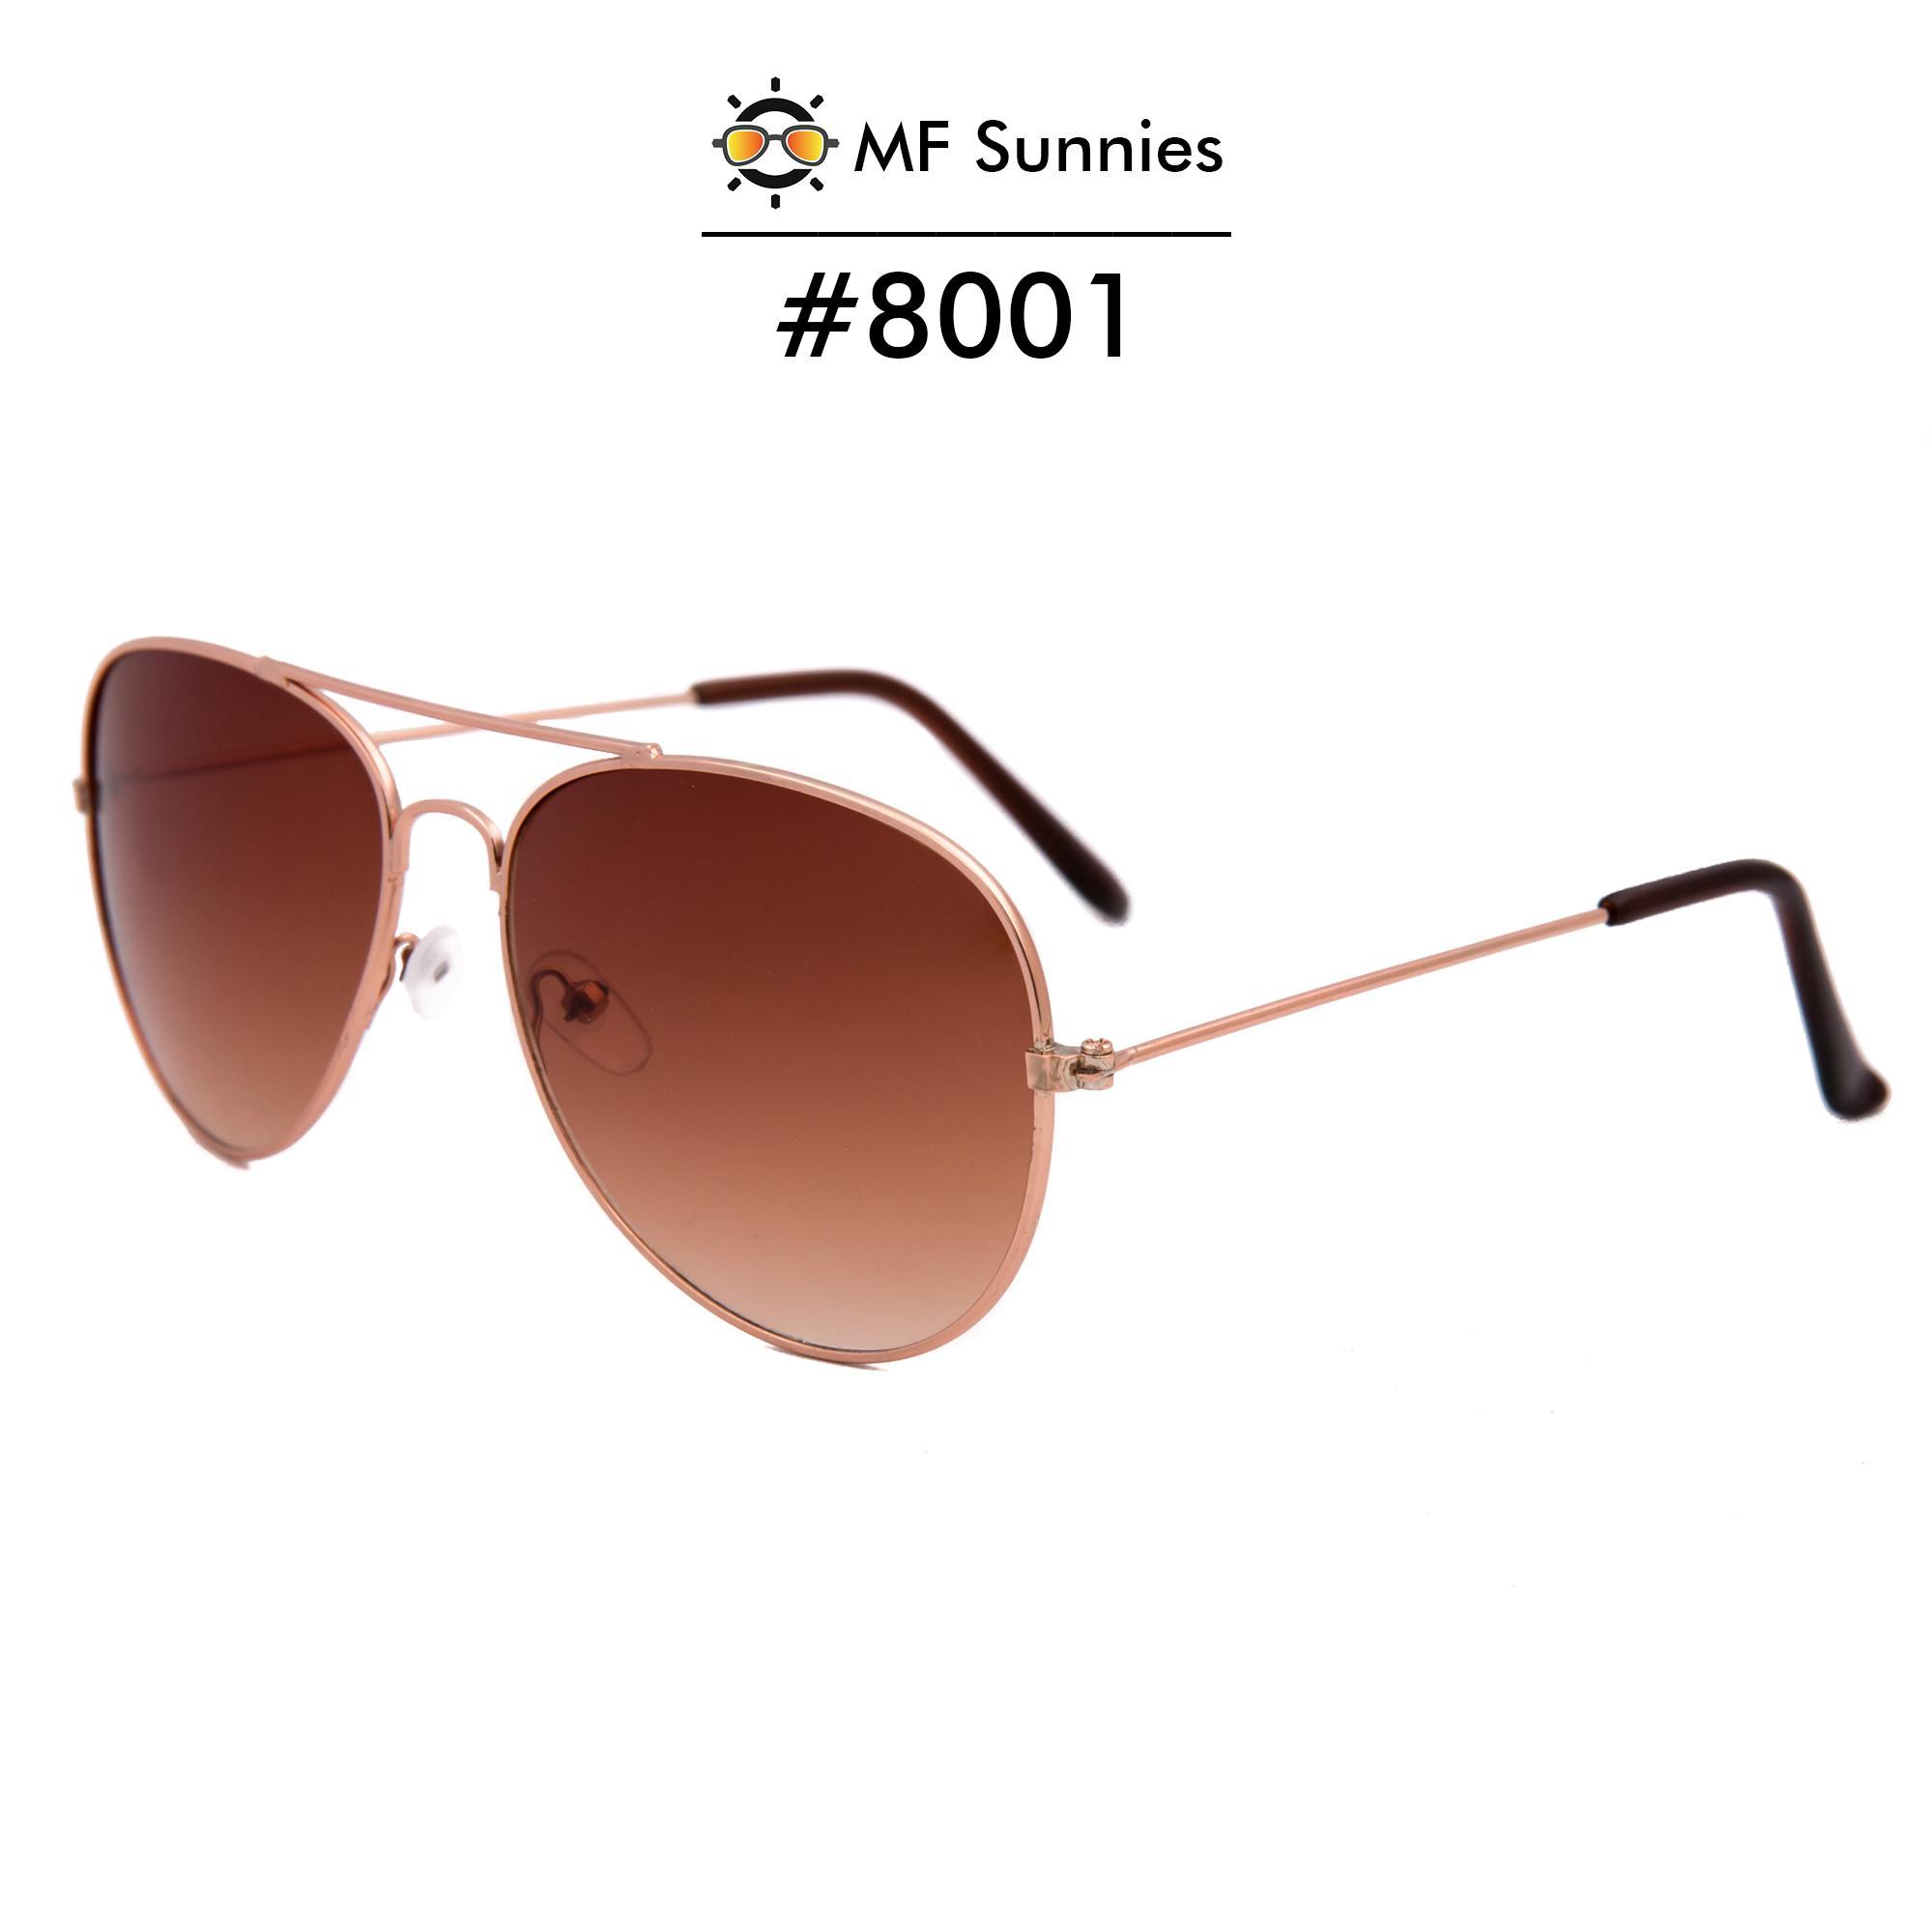 5e869cda784 MFSunnies Classic Classic Aviator Sunglass Metal Frame Fashion Eyewear  Brown  8001